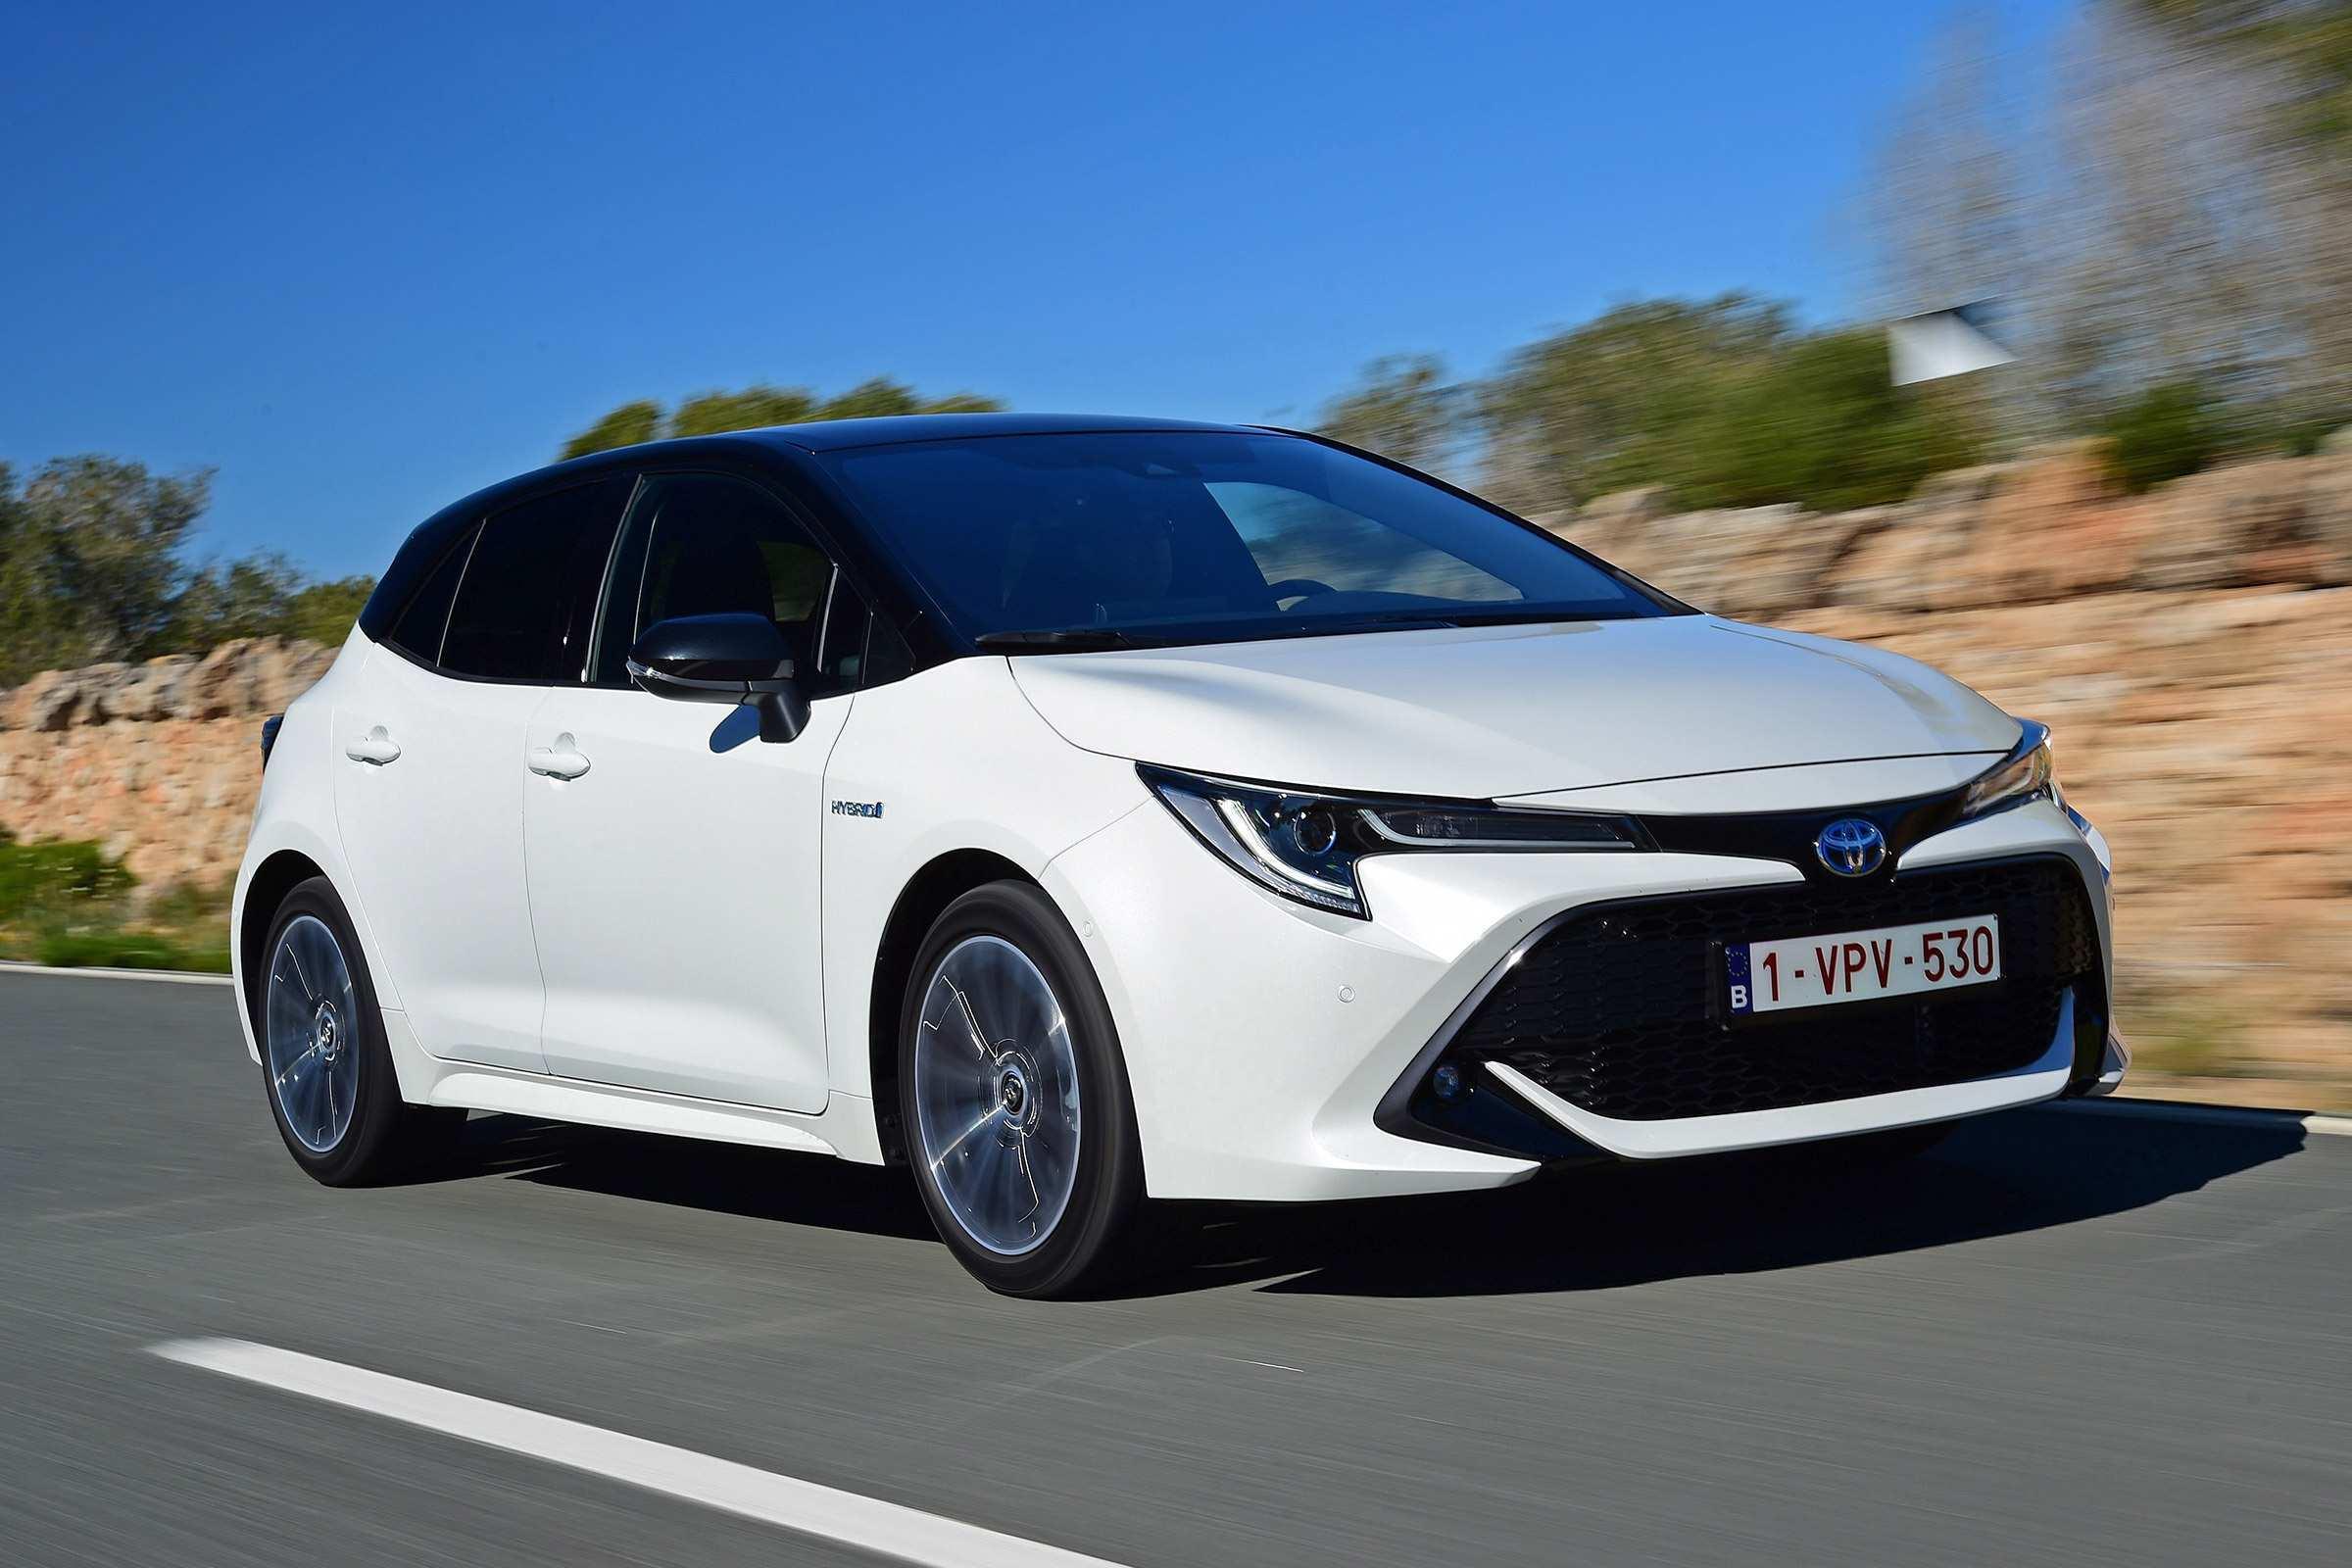 79 New New Sedan Toyota 2019 Overview And Price Specs for New Sedan Toyota 2019 Overview And Price